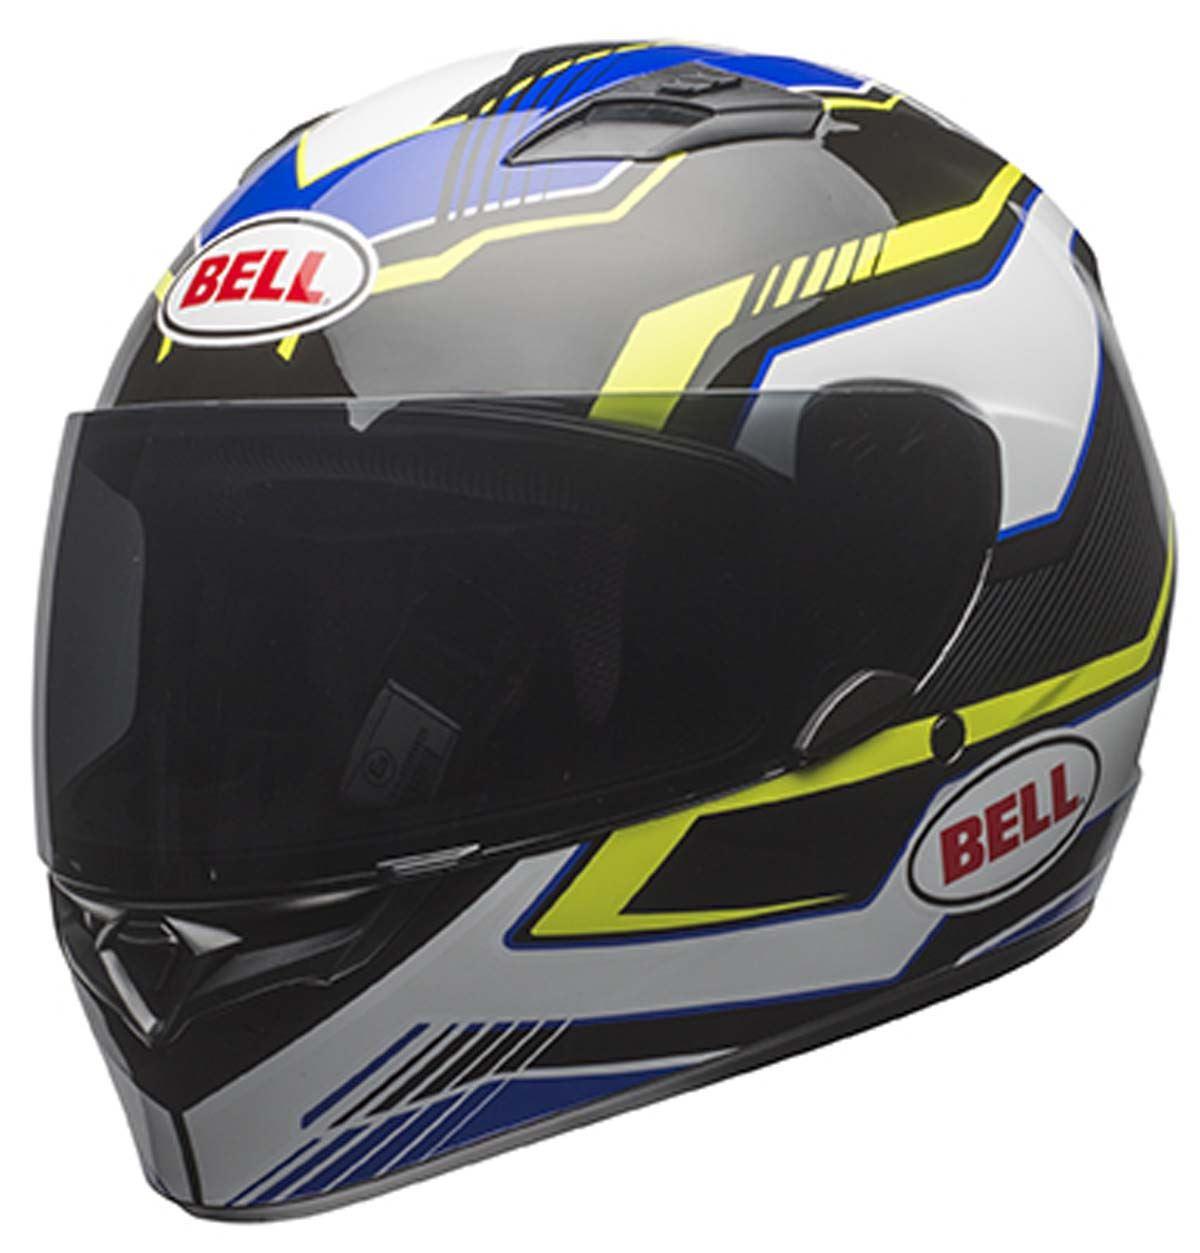 Bell-Qualifier-Helmet-Full-Face-Motorcycle-Clear-Shield-DOT-XS-3XL miniature 24